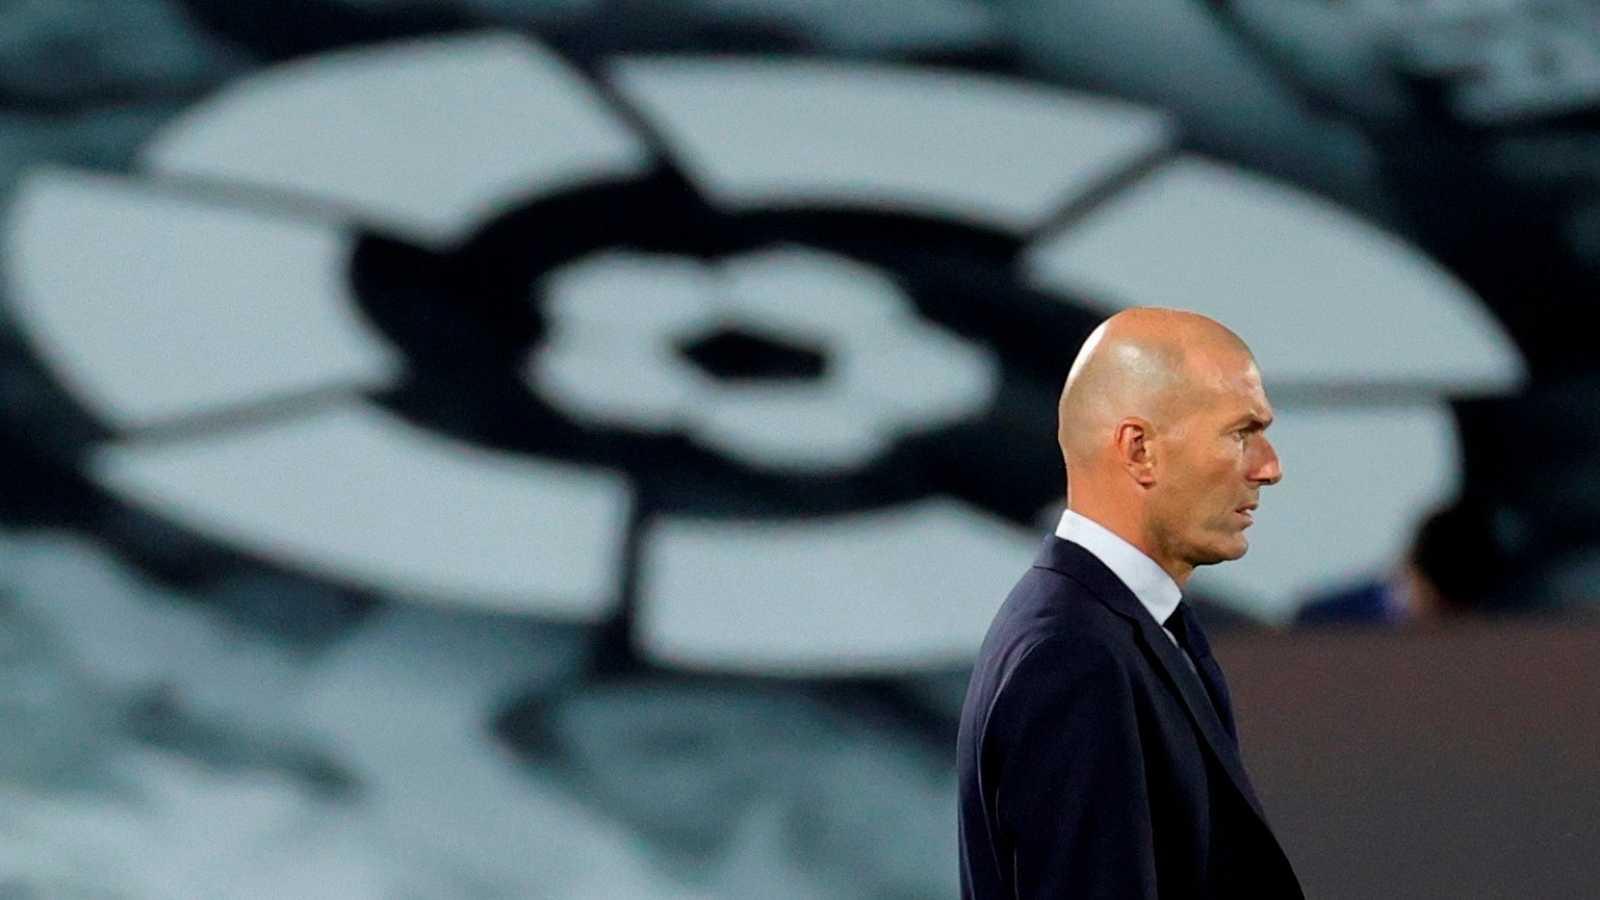 El técnico del Real Madrid, Zinedine Zidane